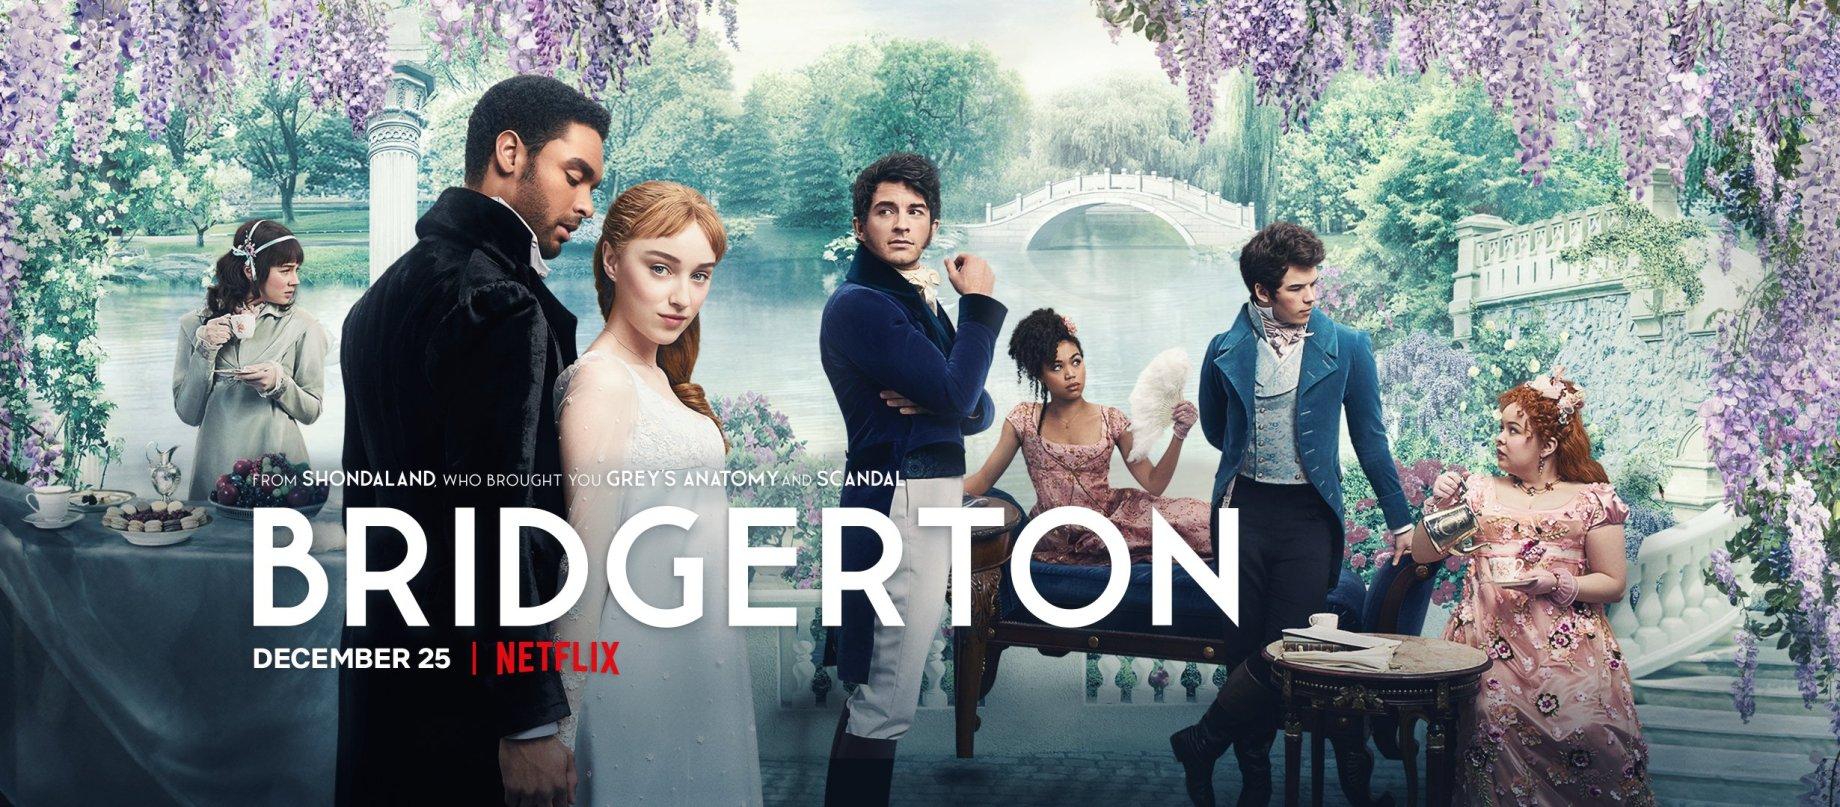 Why Bridgerton Is So Diverse